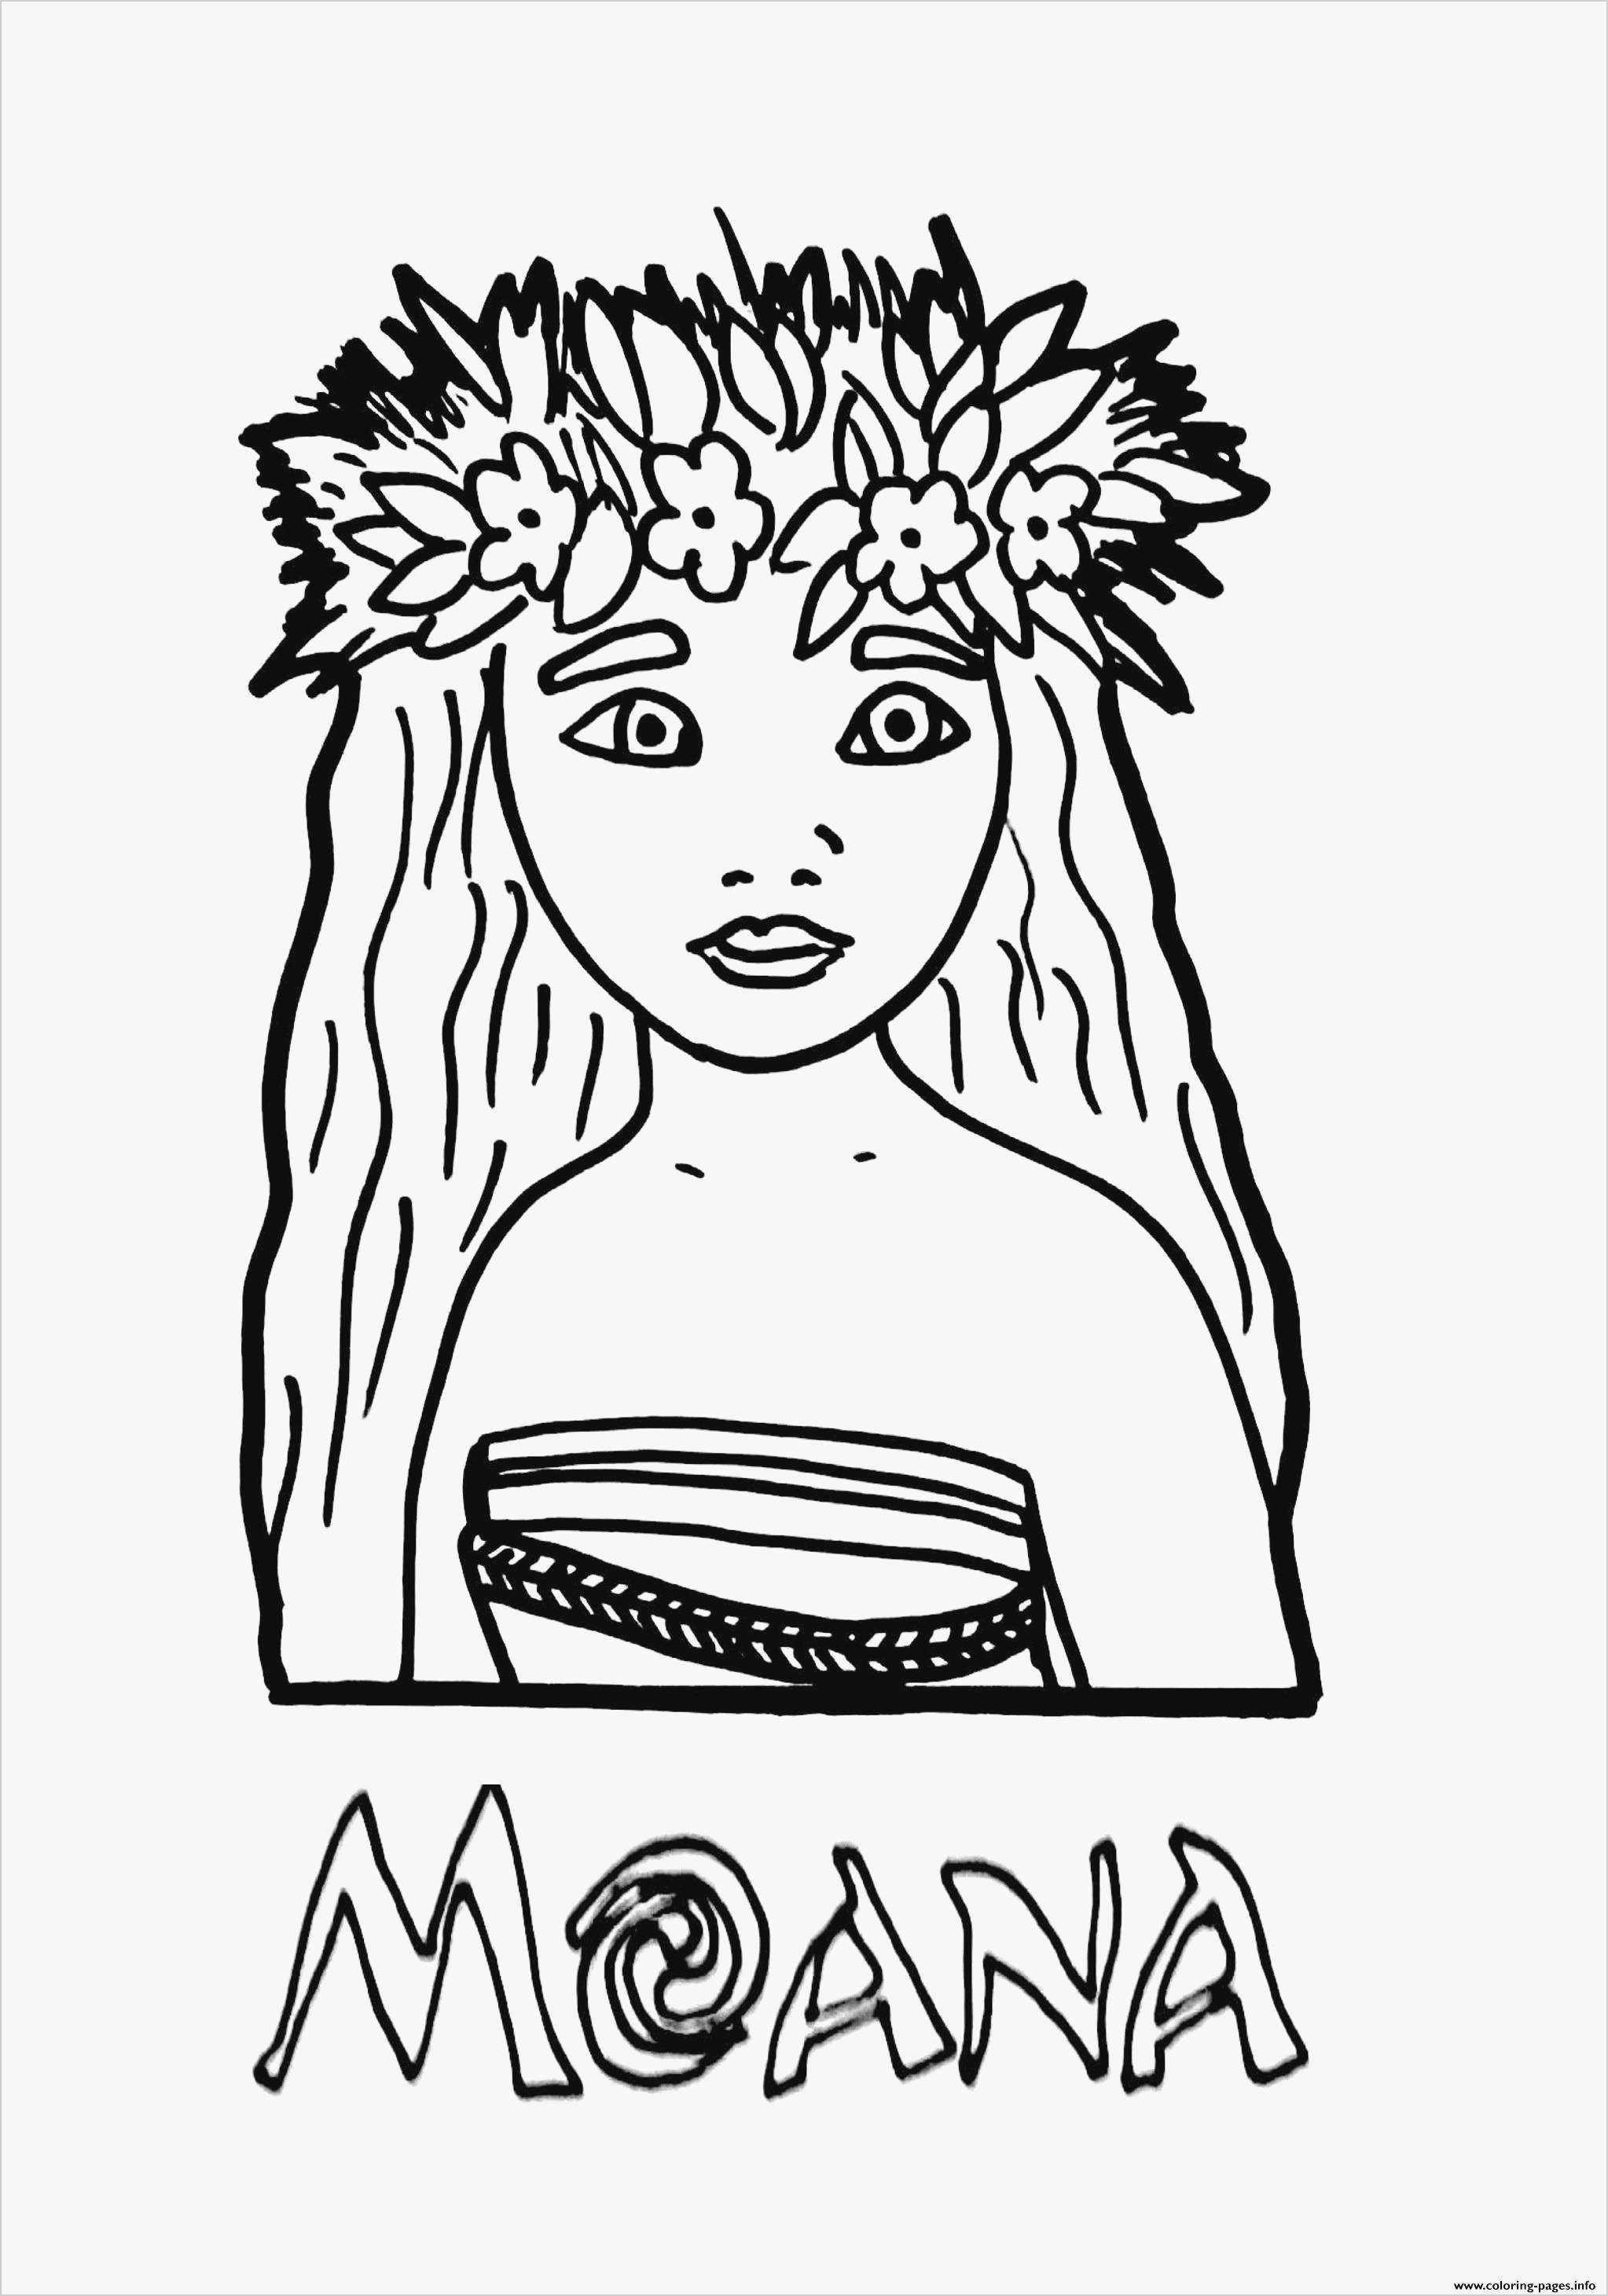 Malvorlagen Elsa Und Anna Frisch Elsa Frozen Drawing New Frozen Coloring Pages Inspirational Elsa Stock